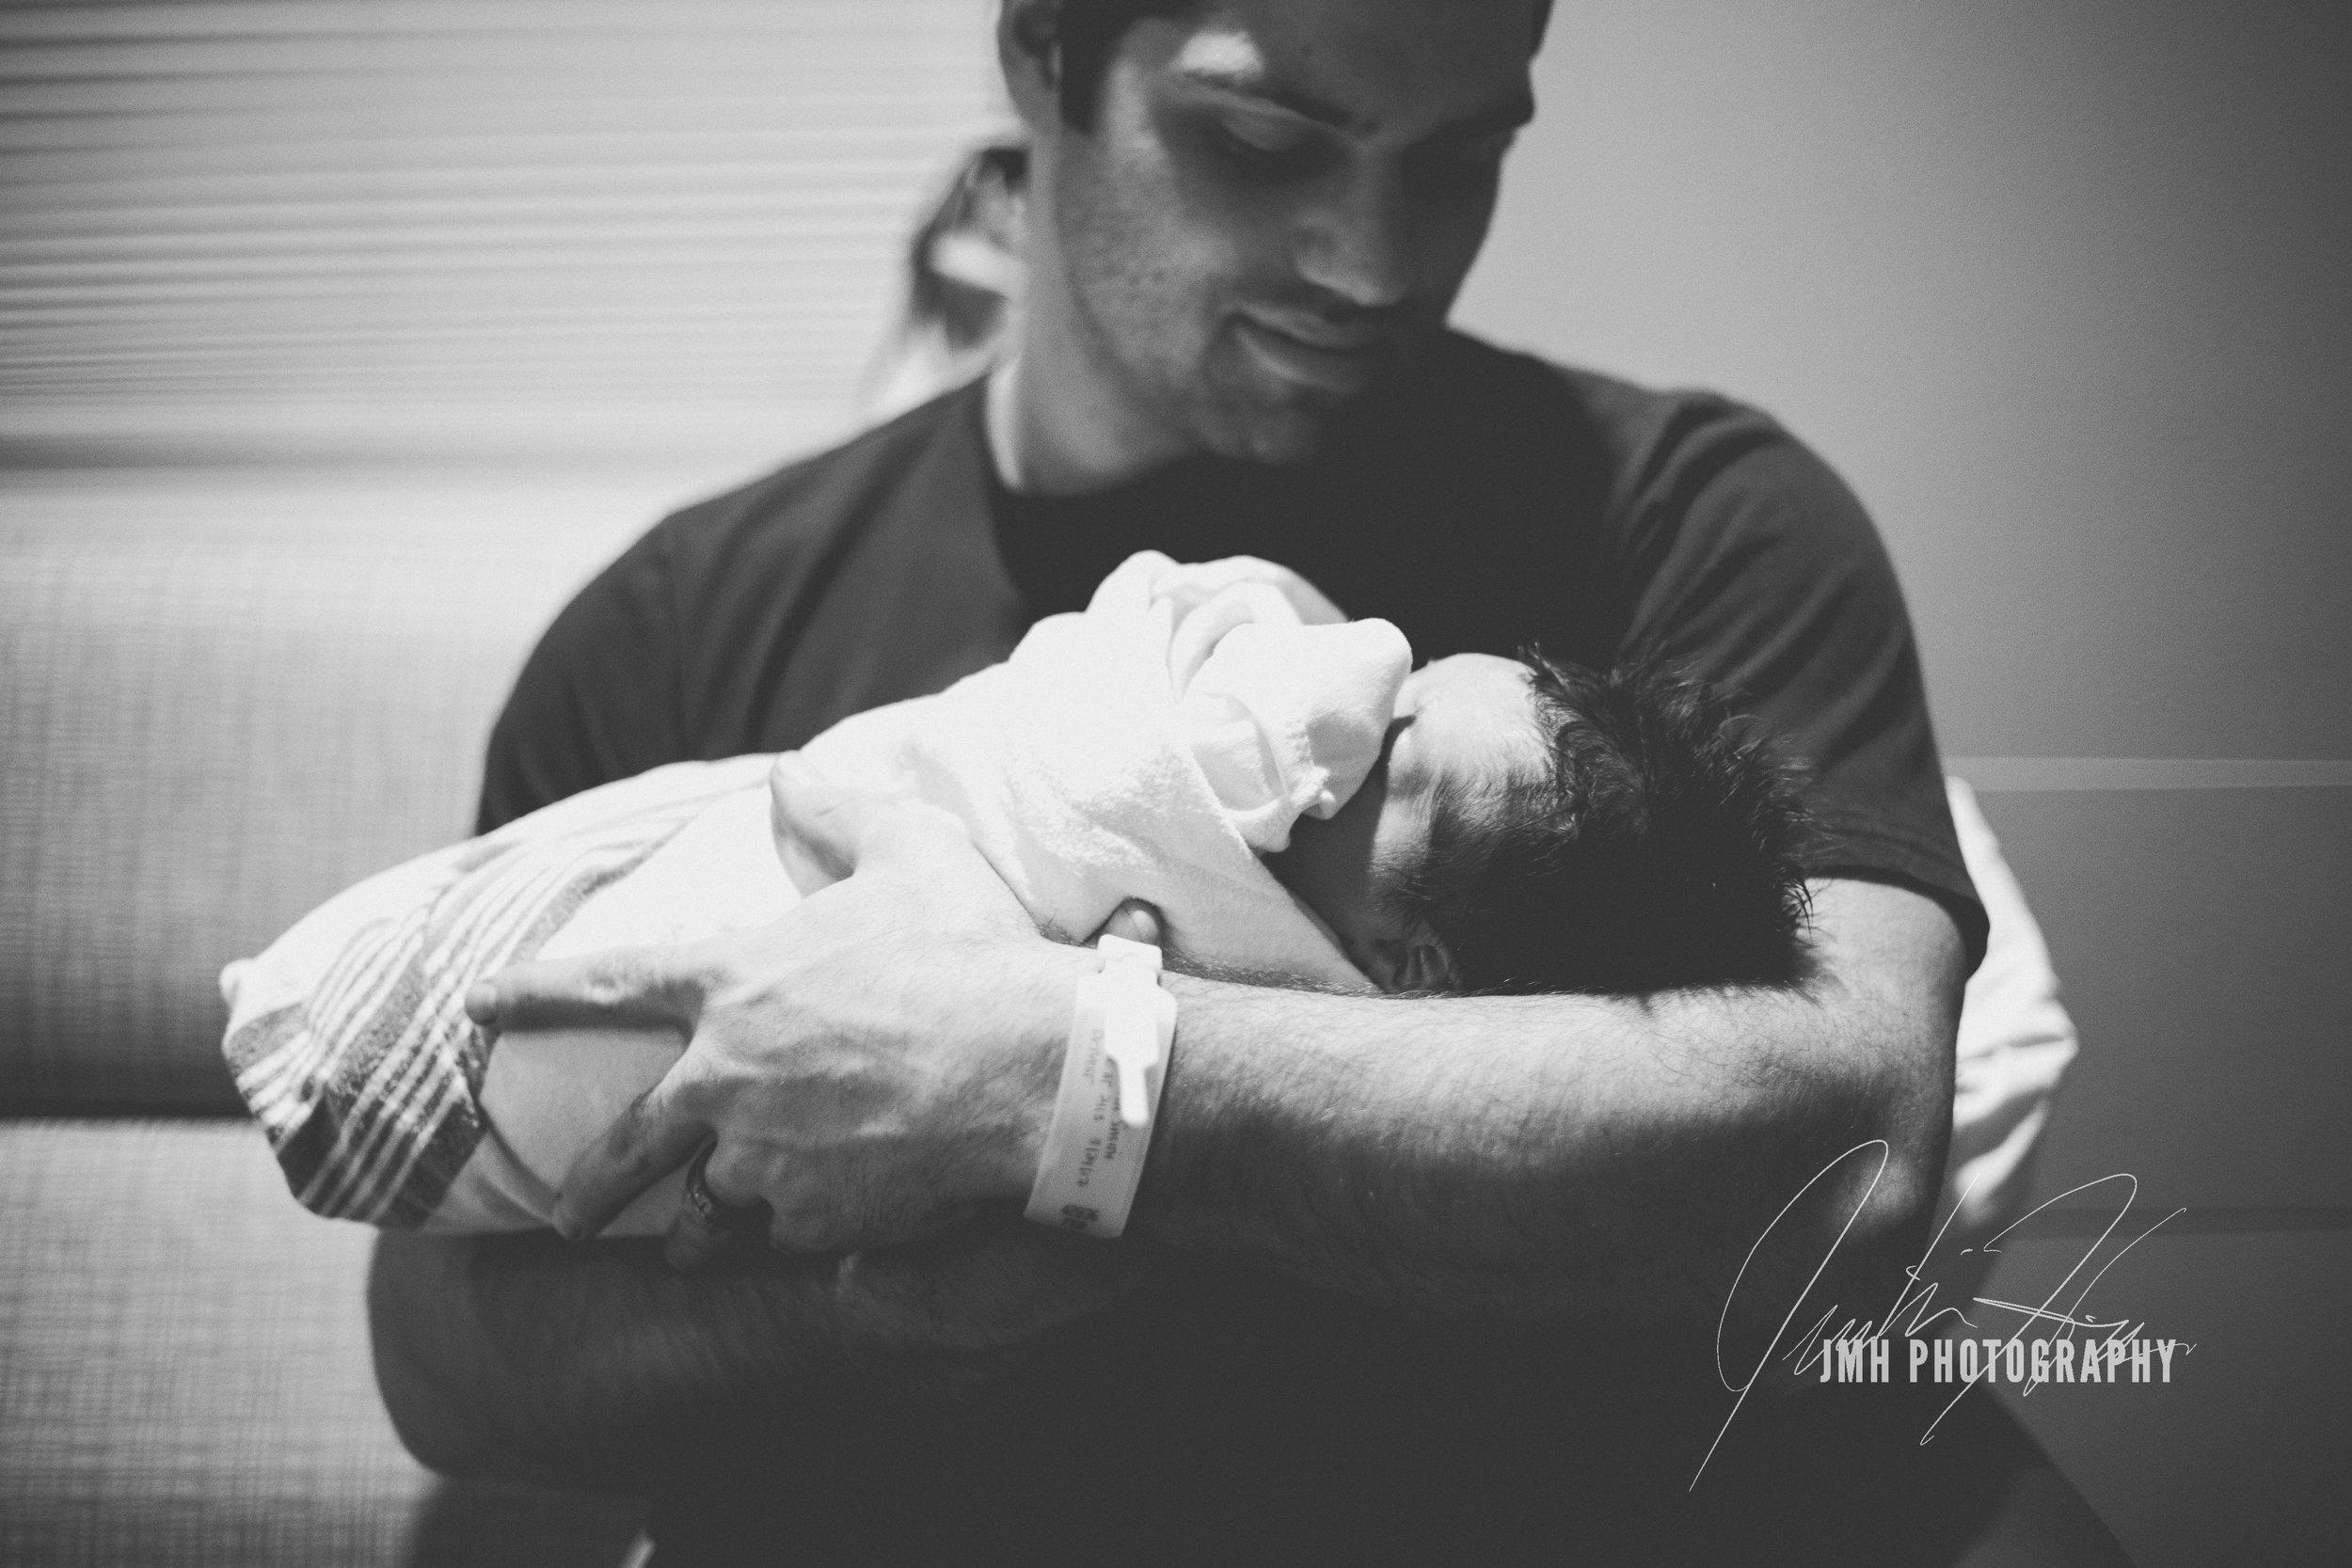 grandrapids_birth_photography-40.jpg